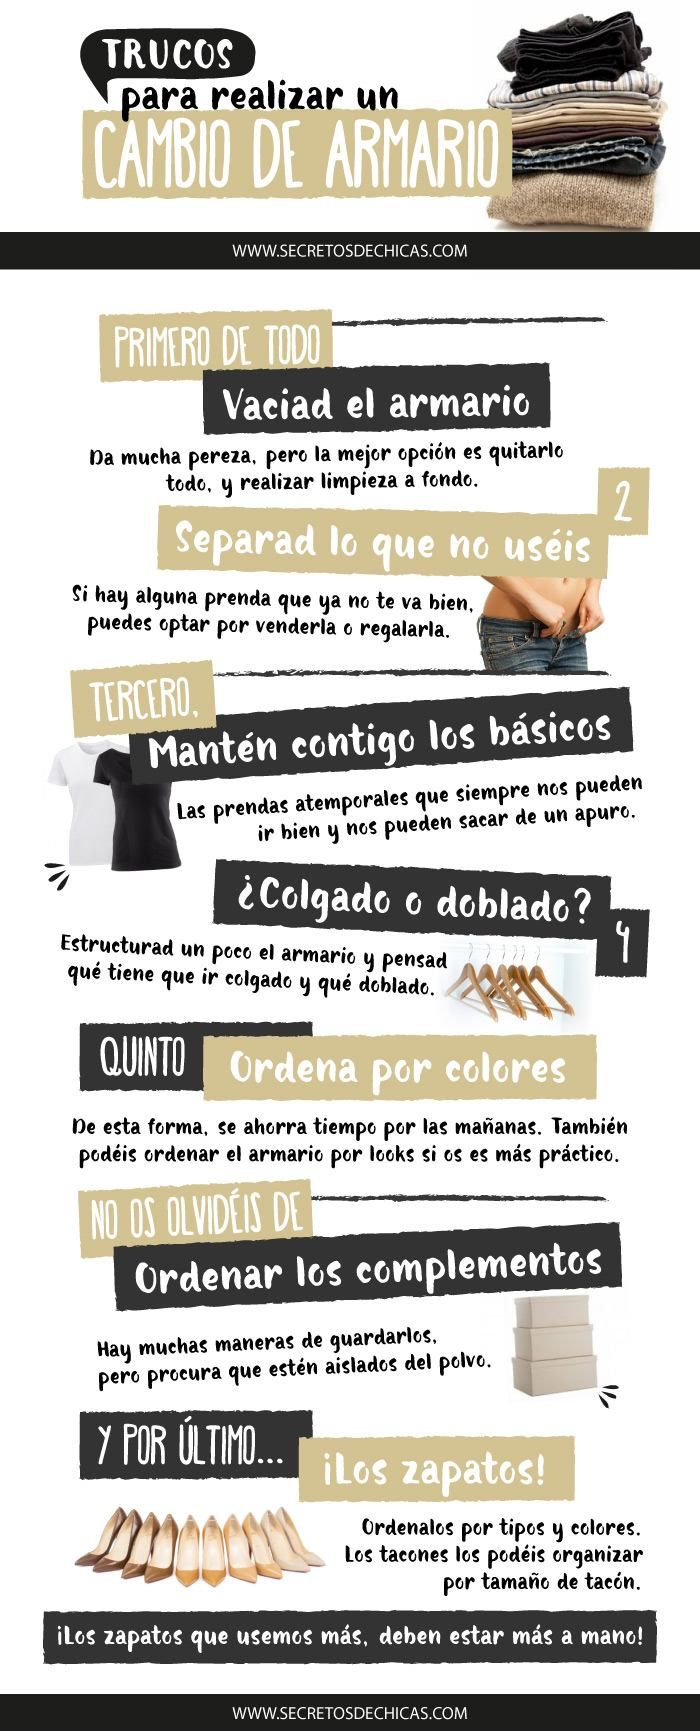 16a7b7042 TRUCOS PARA REALIZAR UN CAMBIO DE ARMARIO - Secretos de Chicas by ...